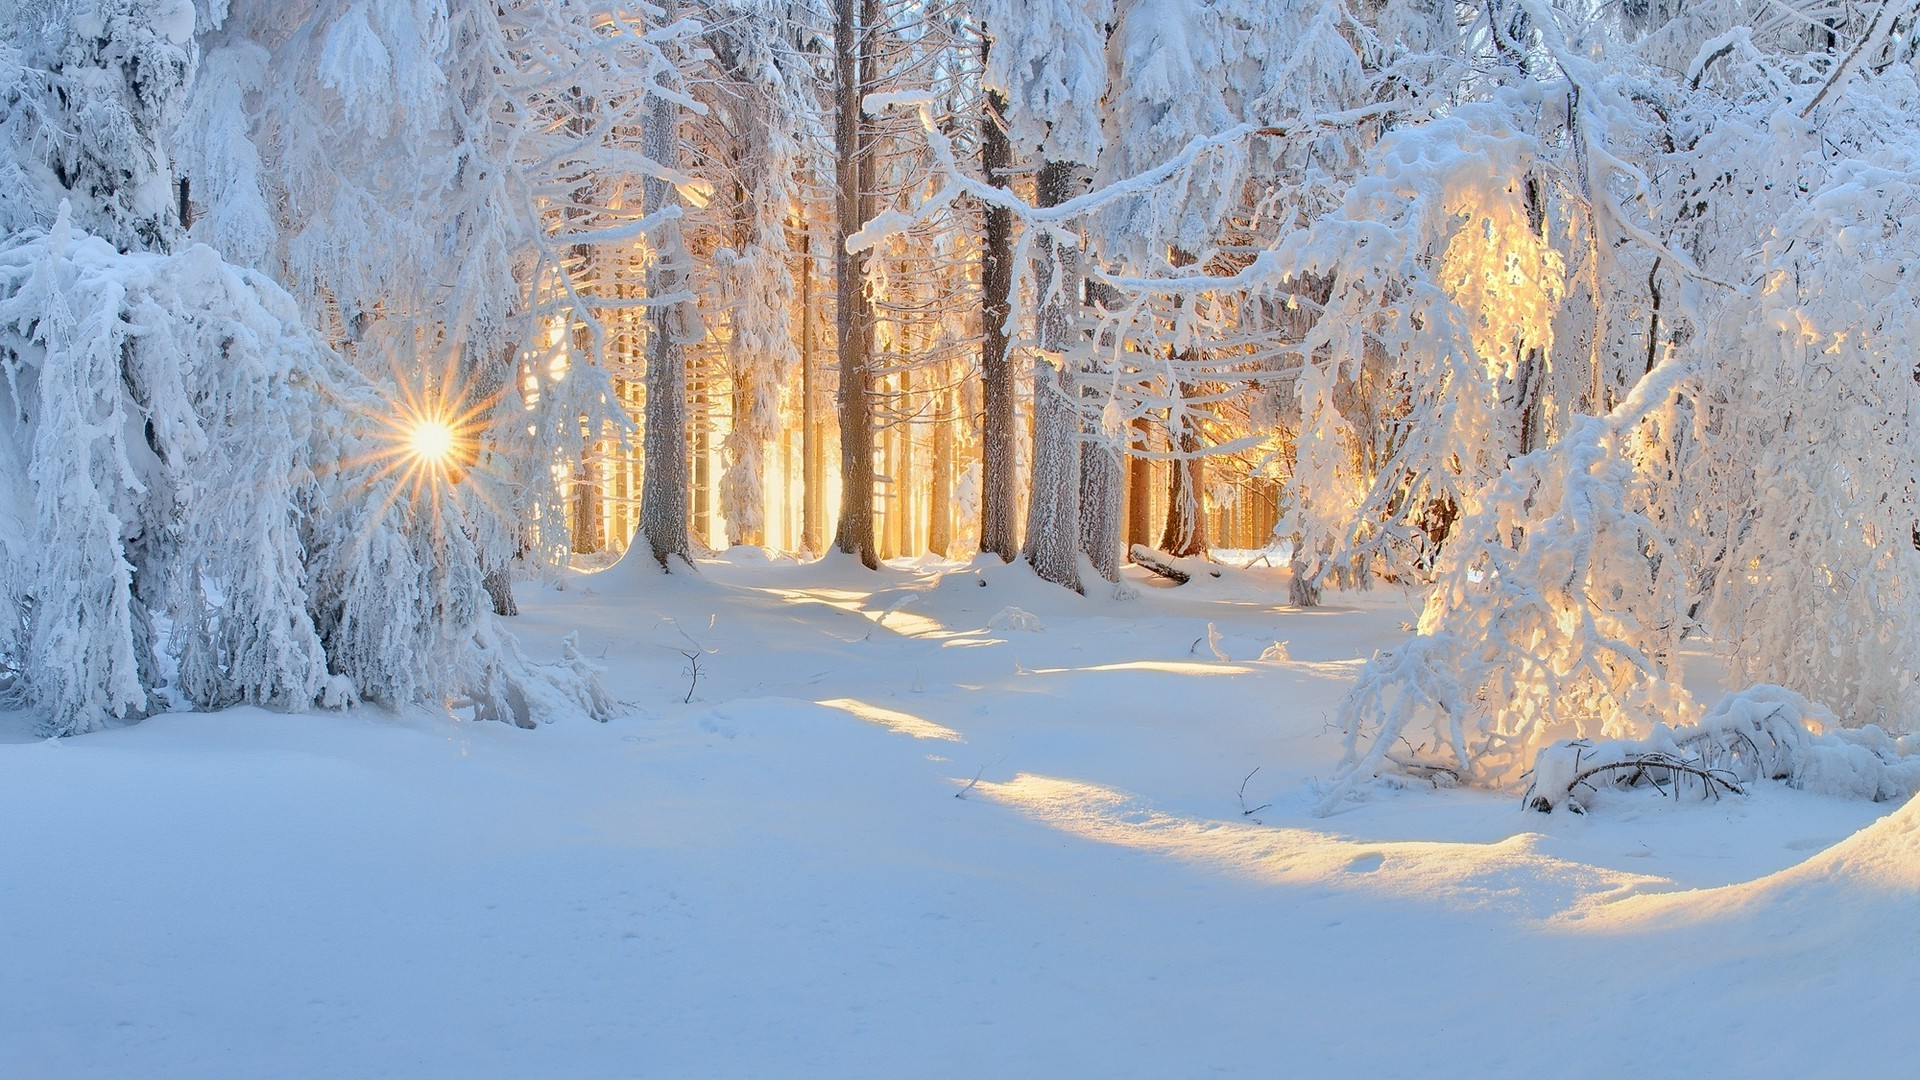 7 5 White Christmas Tree